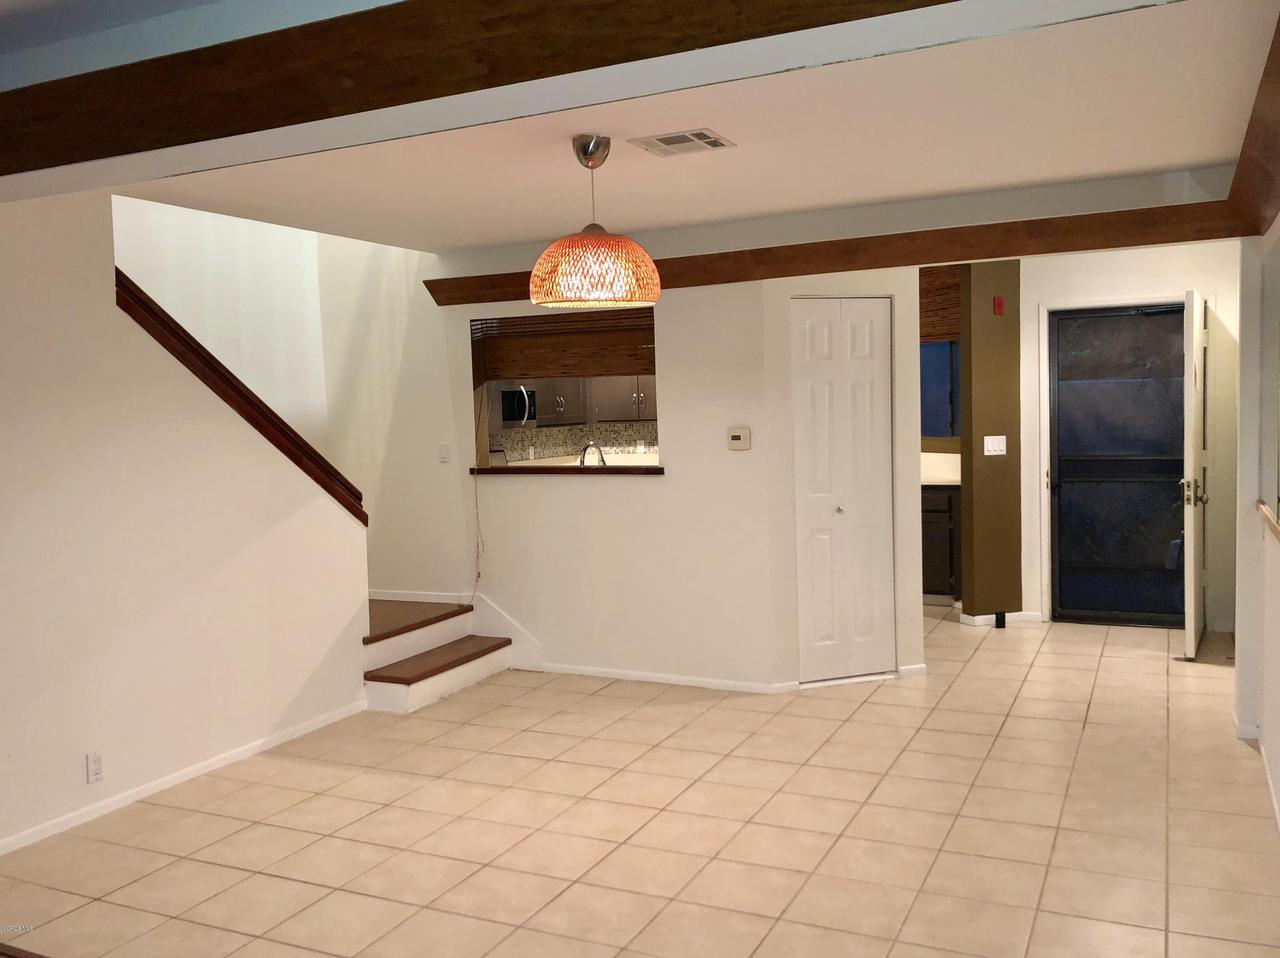 707 ISLAND VIEW, Port Hueneme, CA 93041 - ENTRANCE/DINING AREA